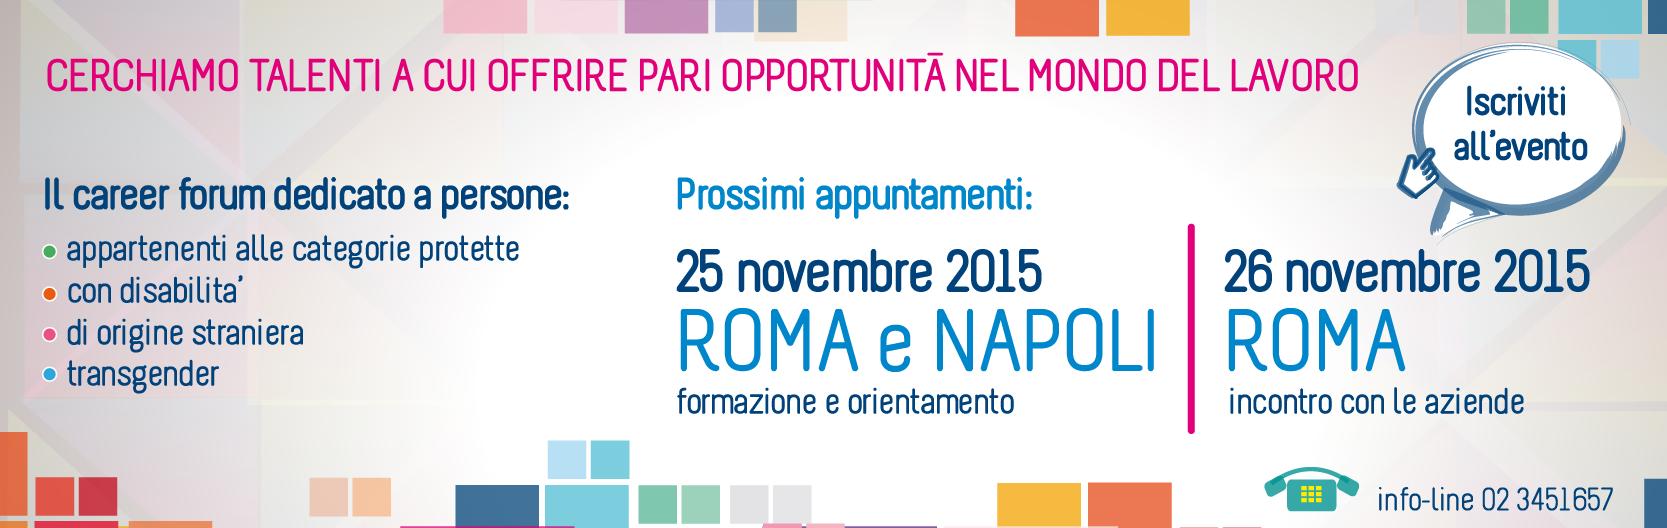 Diversitalavoro, career forum Roma e Napoli